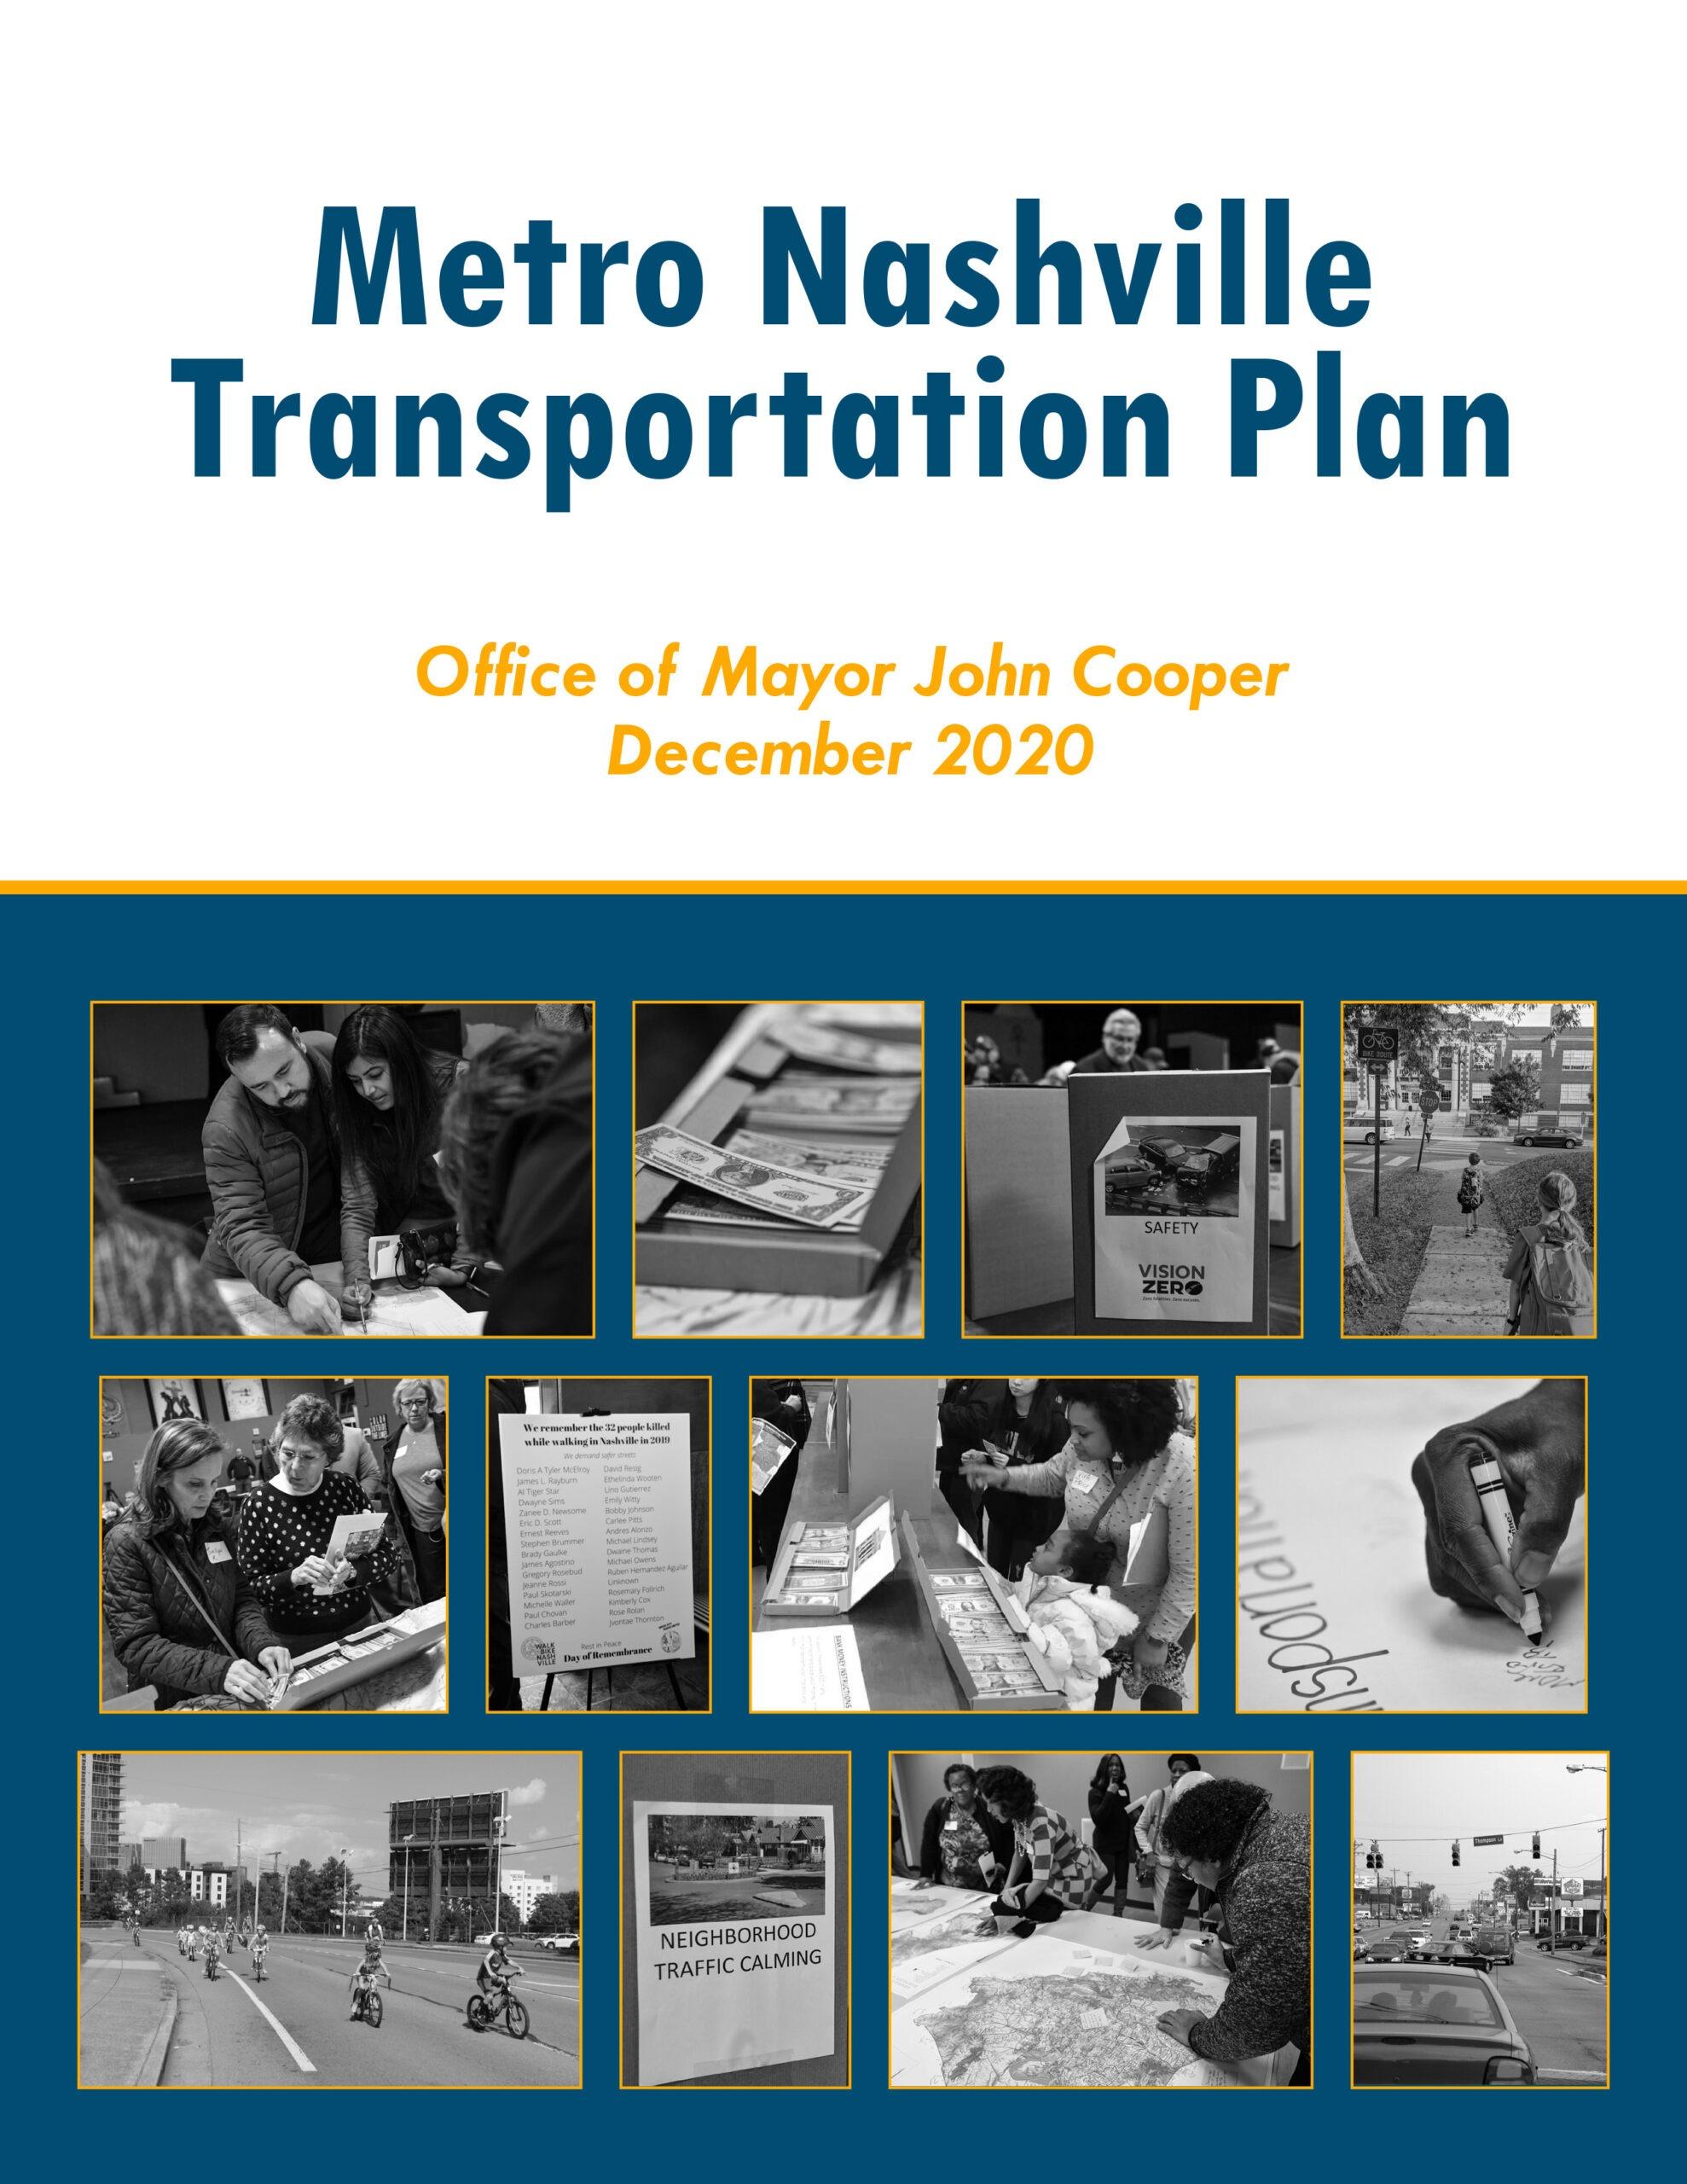 The Office of Mayor John Cooper Released the Metro Nashville Transportation Plan